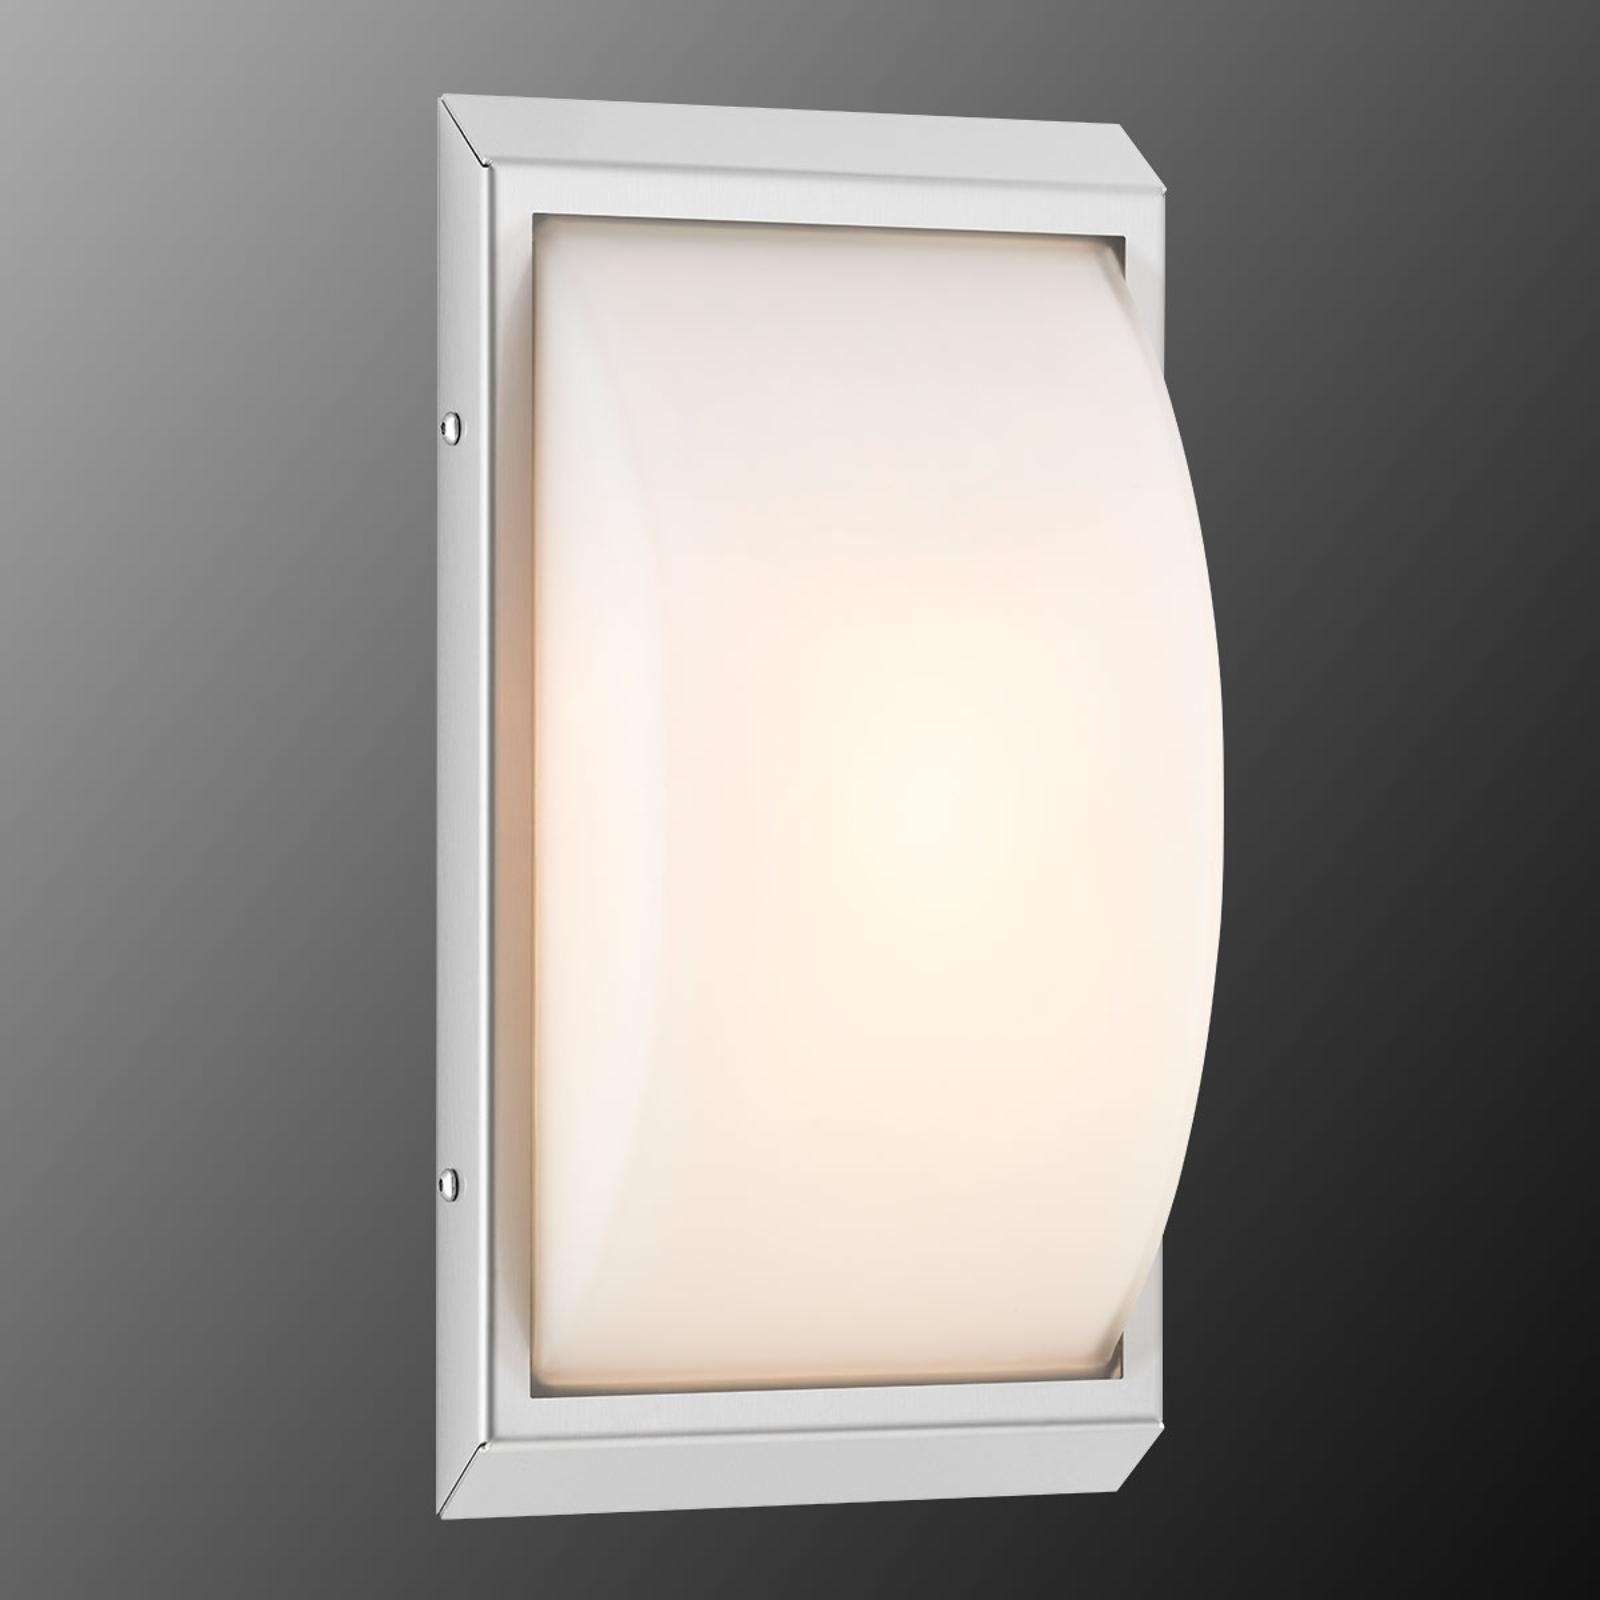 Malte LED outdoor wall light_6068057_1